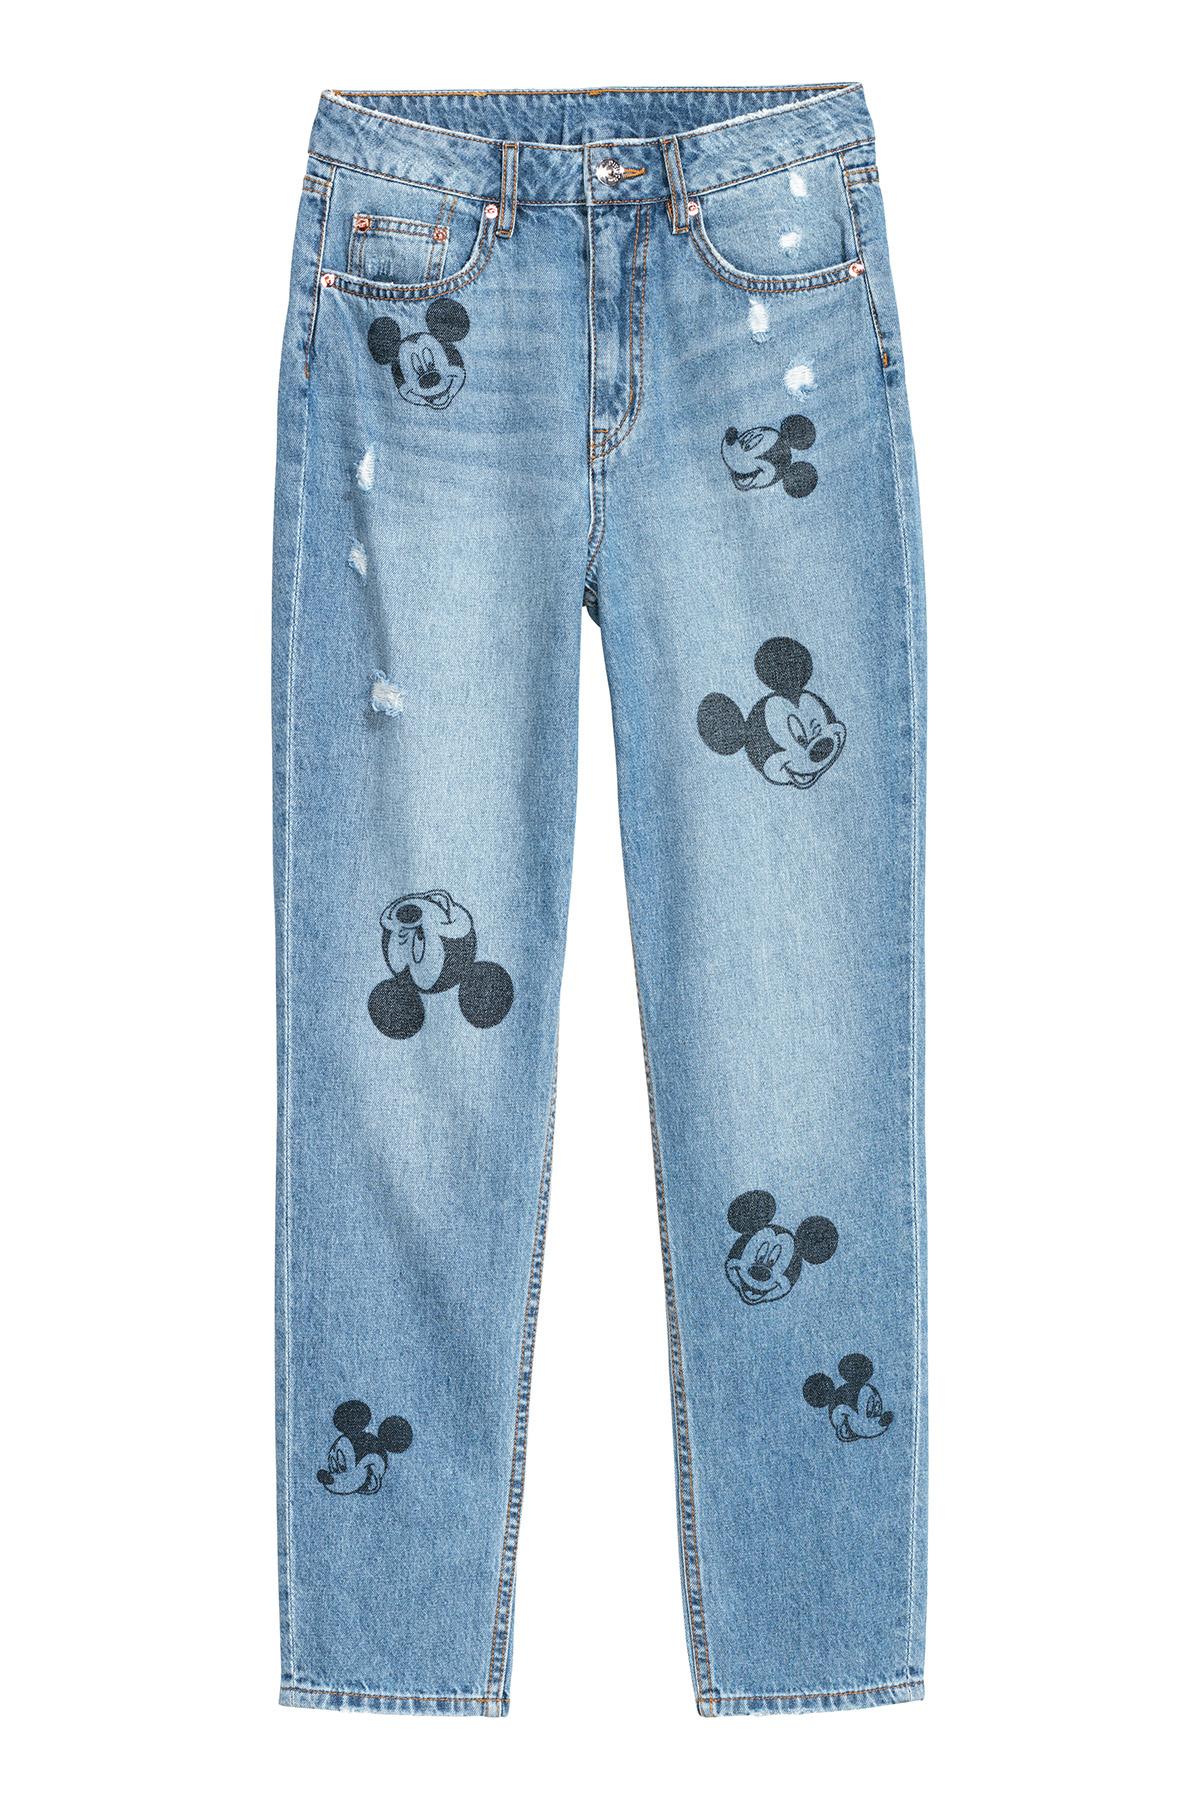 شلال مكبس أرشيف Pantalon Vaquero Mickey Natural Soap Directory Org